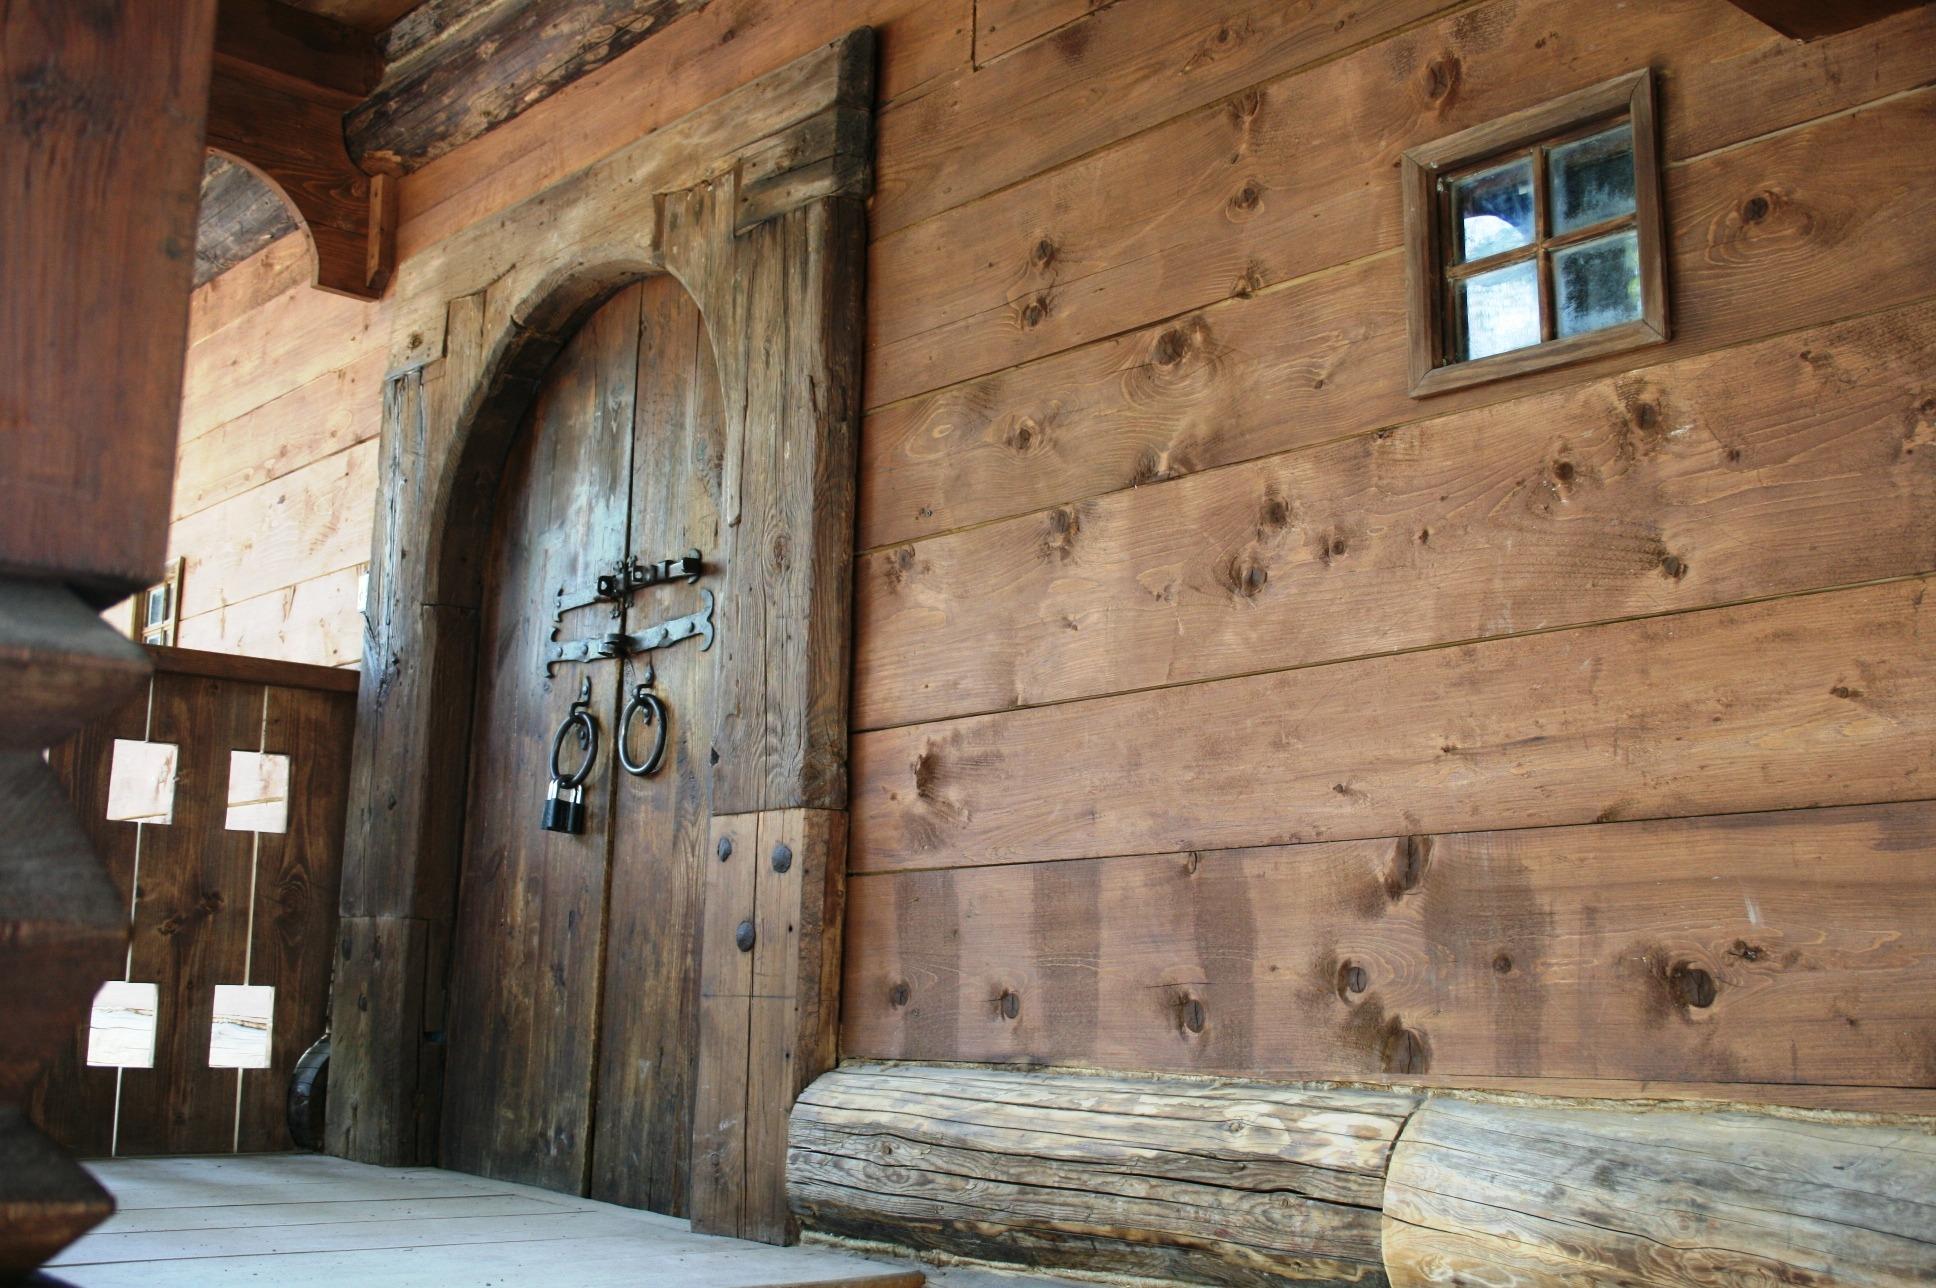 Wood House Building Wall Entrance Interior Design Wooden Door Logs Estate Log  Cabin Glass Window Man